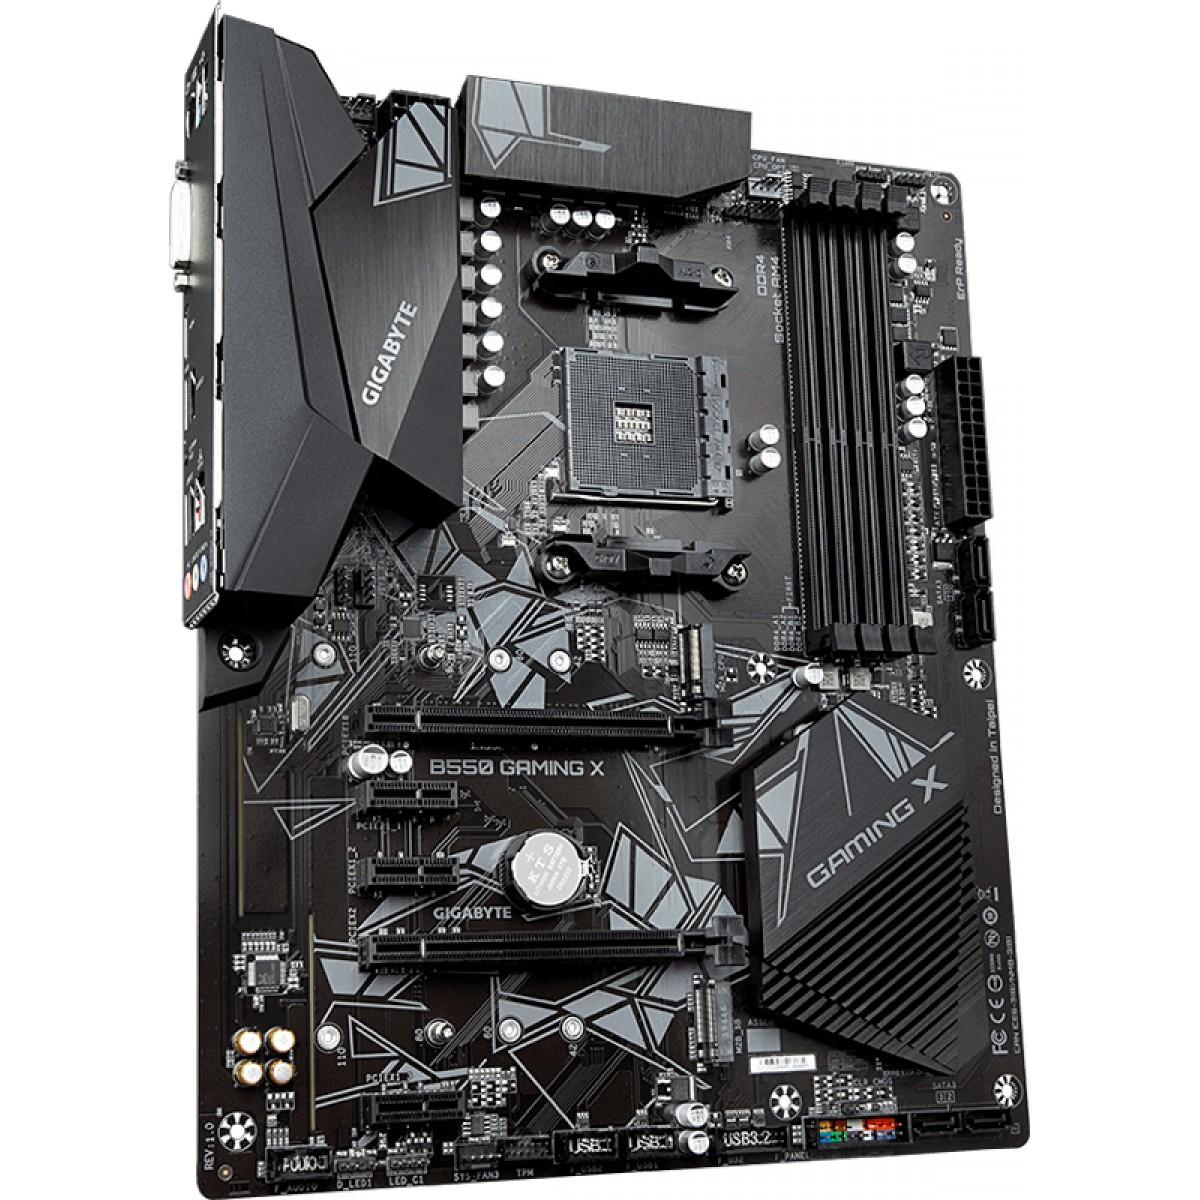 Placa Mãe Gigabyte B550 Gaming X, Chipset B550, AMD AM4, ATX, DDR4